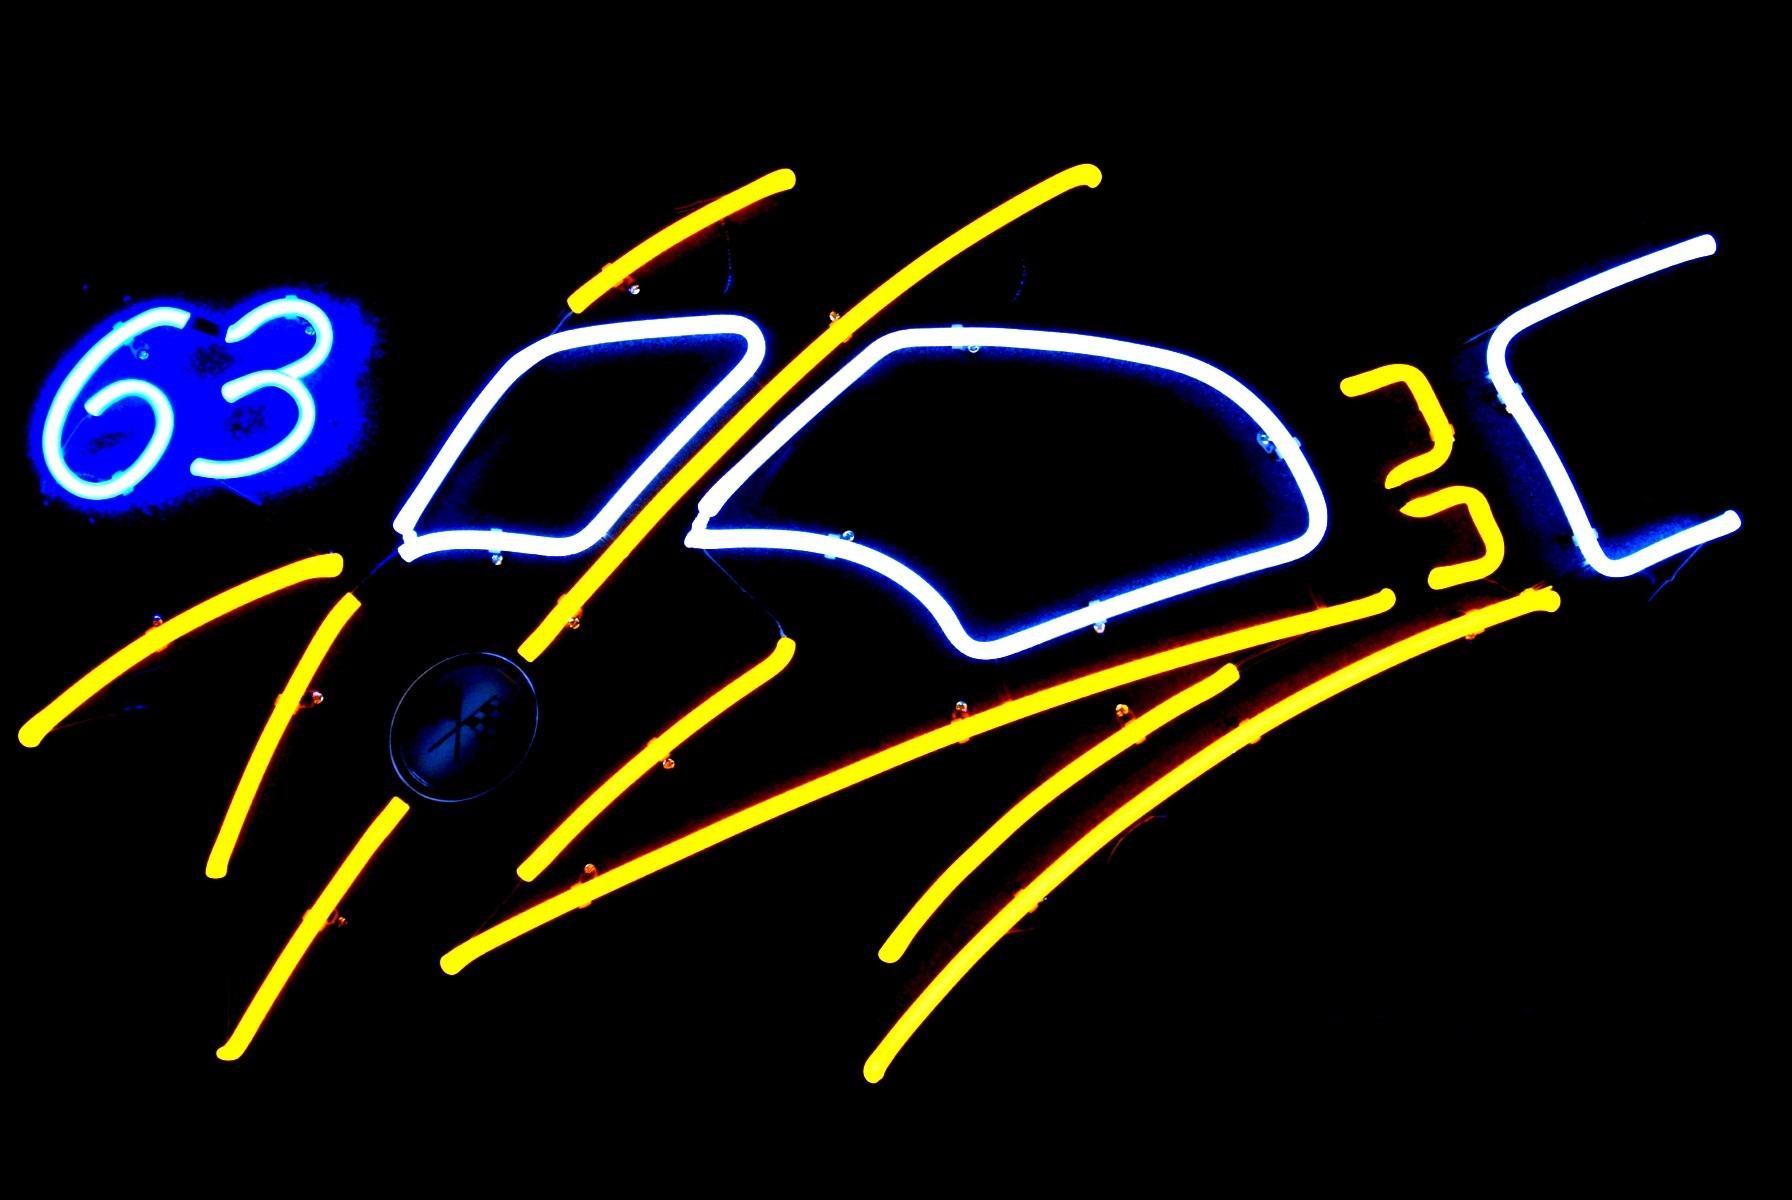 63 Split Window Vette Neon Light Sculpture by John Barton - BartonNeonMagic.com